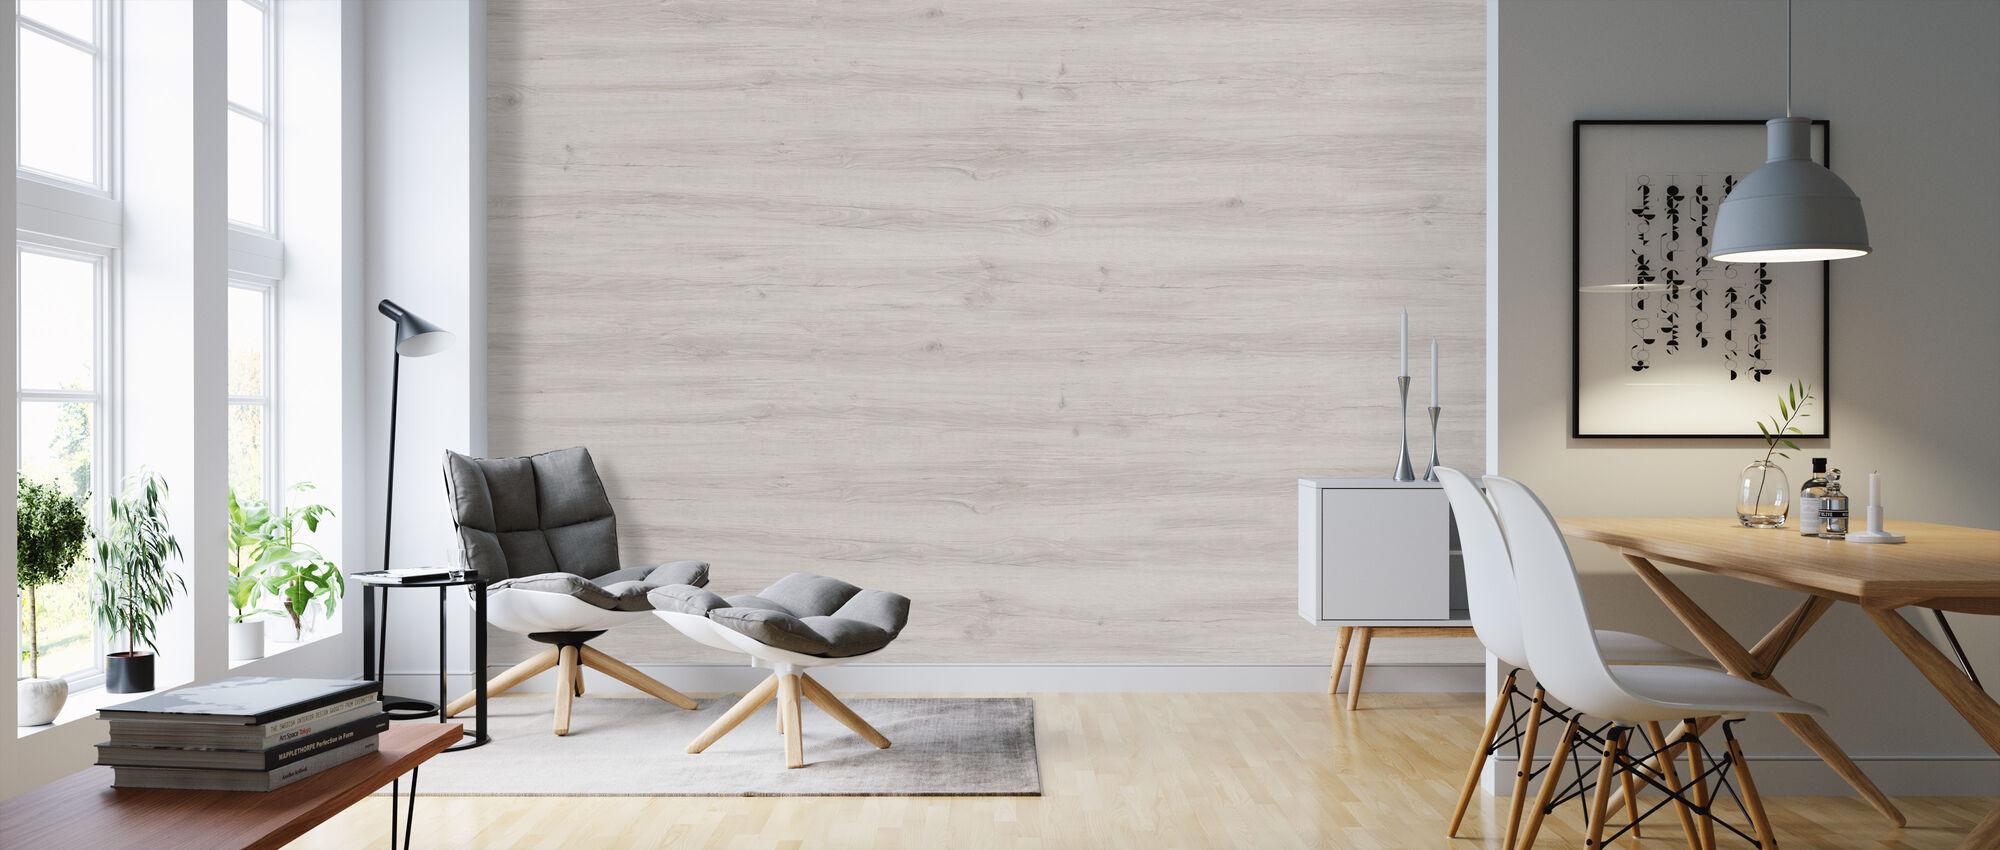 Rustic Wood II - Wallpaper - Living Room